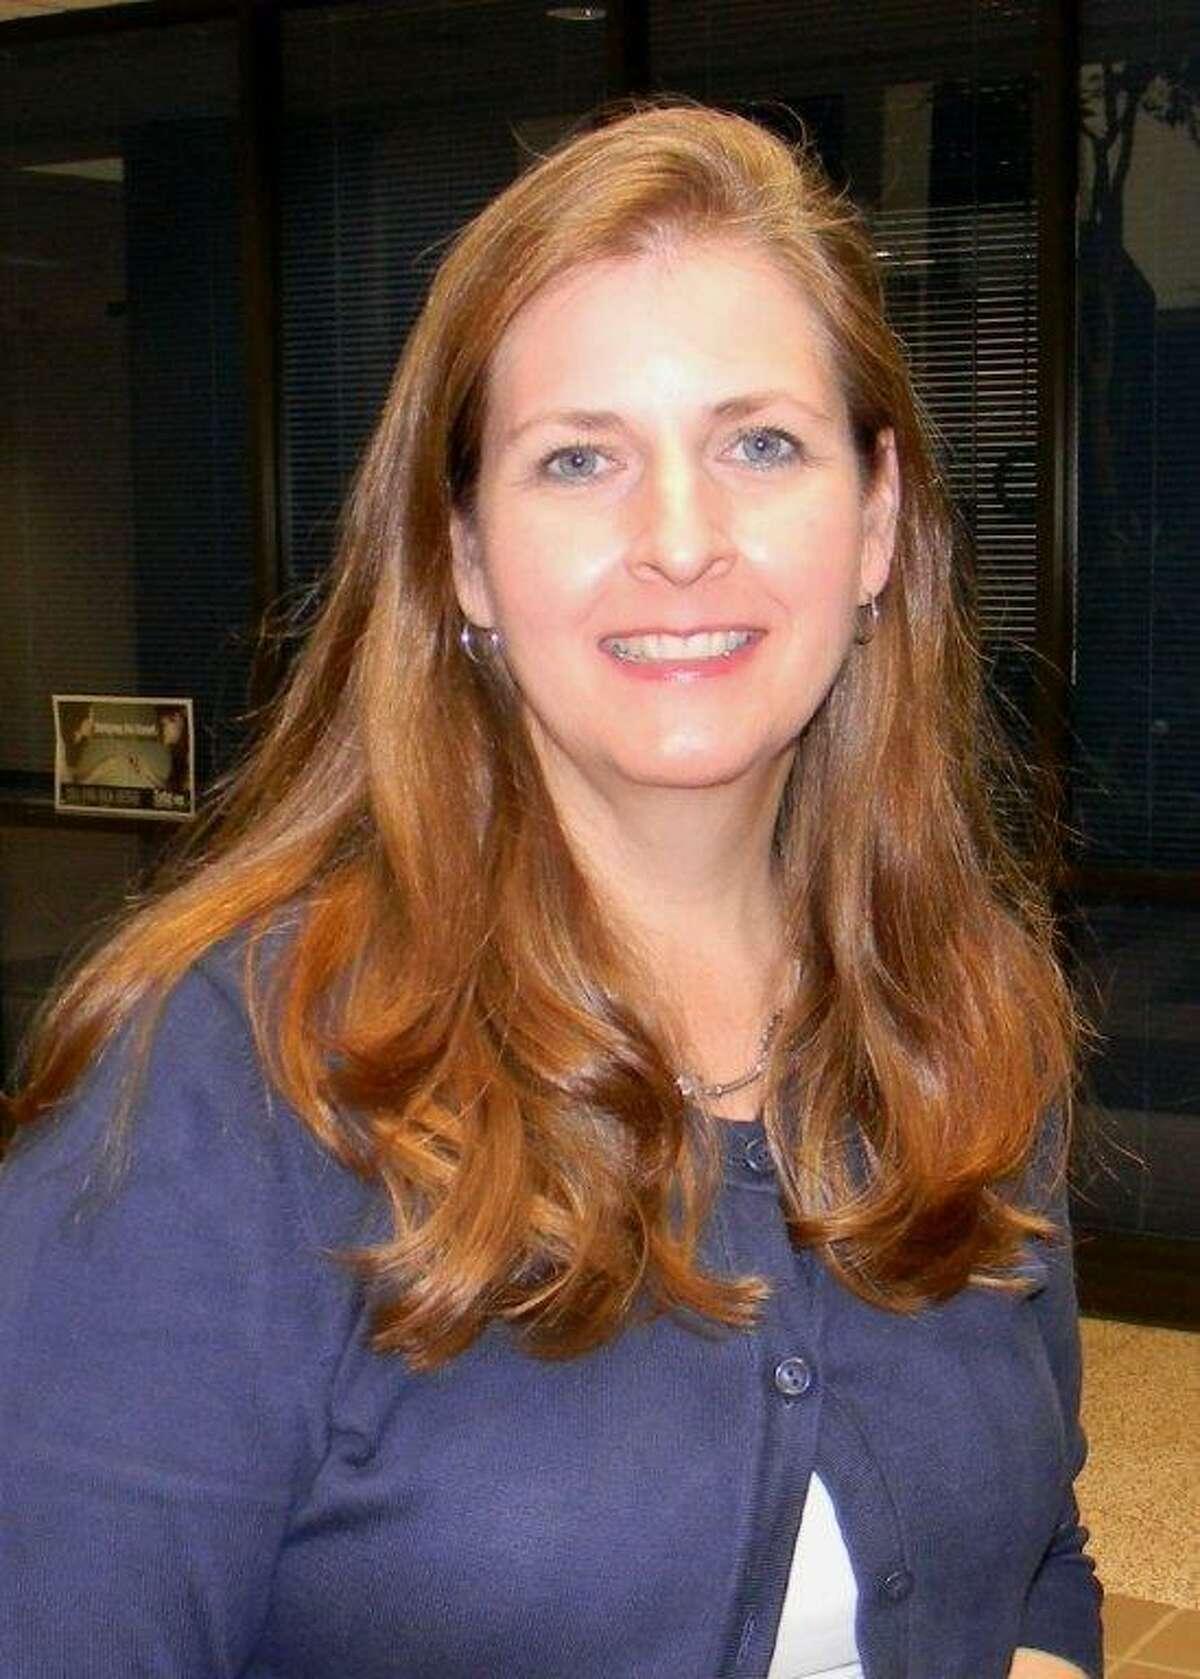 Commonwealth elementary principal Joanna Hagler.